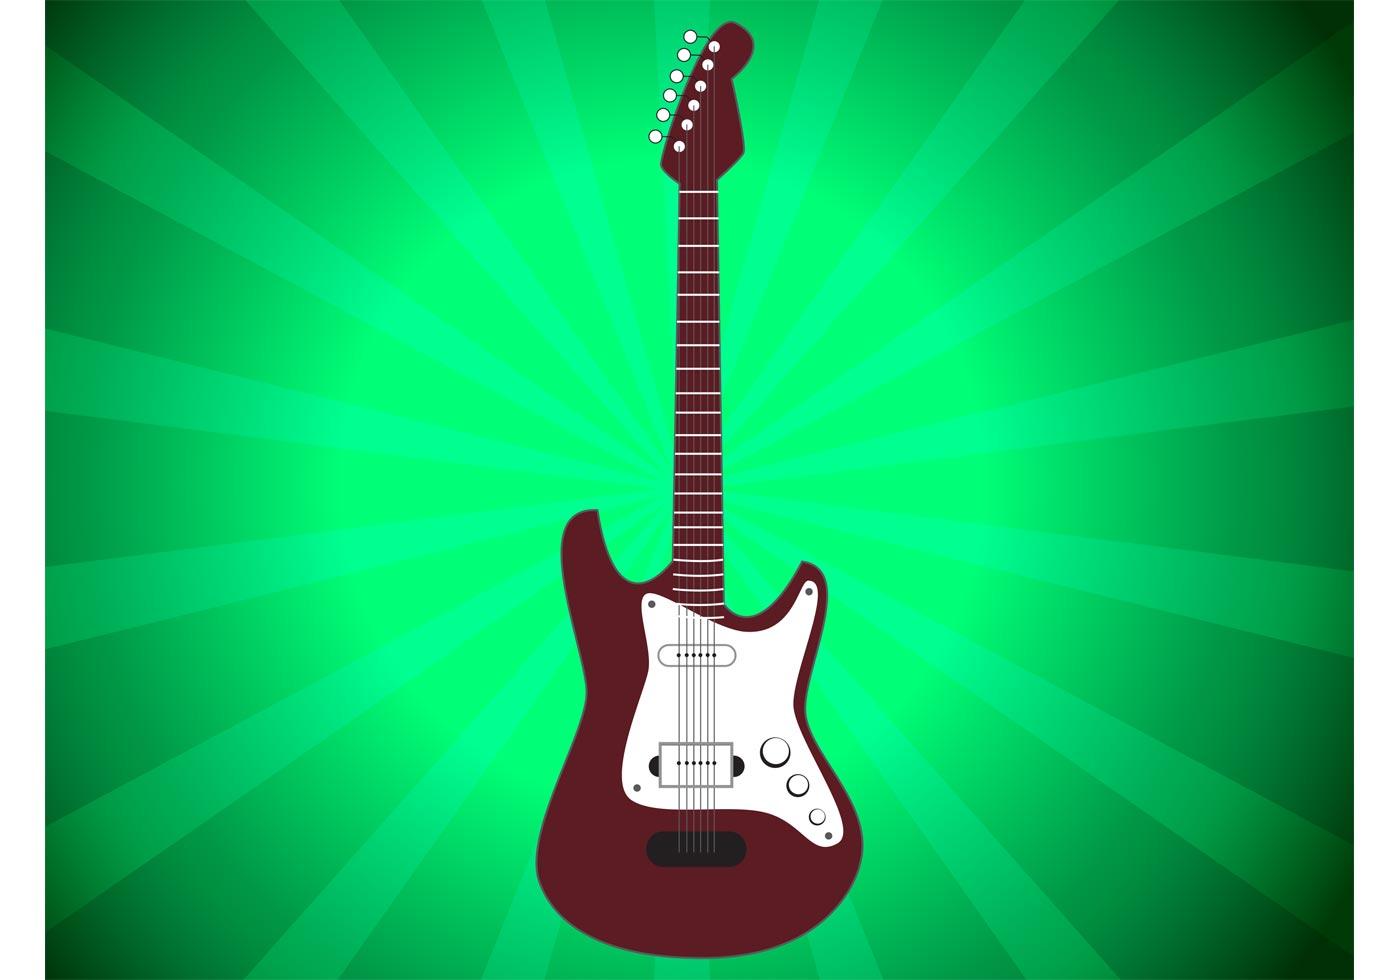 electric guitar vector download free vector art stock graphics images. Black Bedroom Furniture Sets. Home Design Ideas